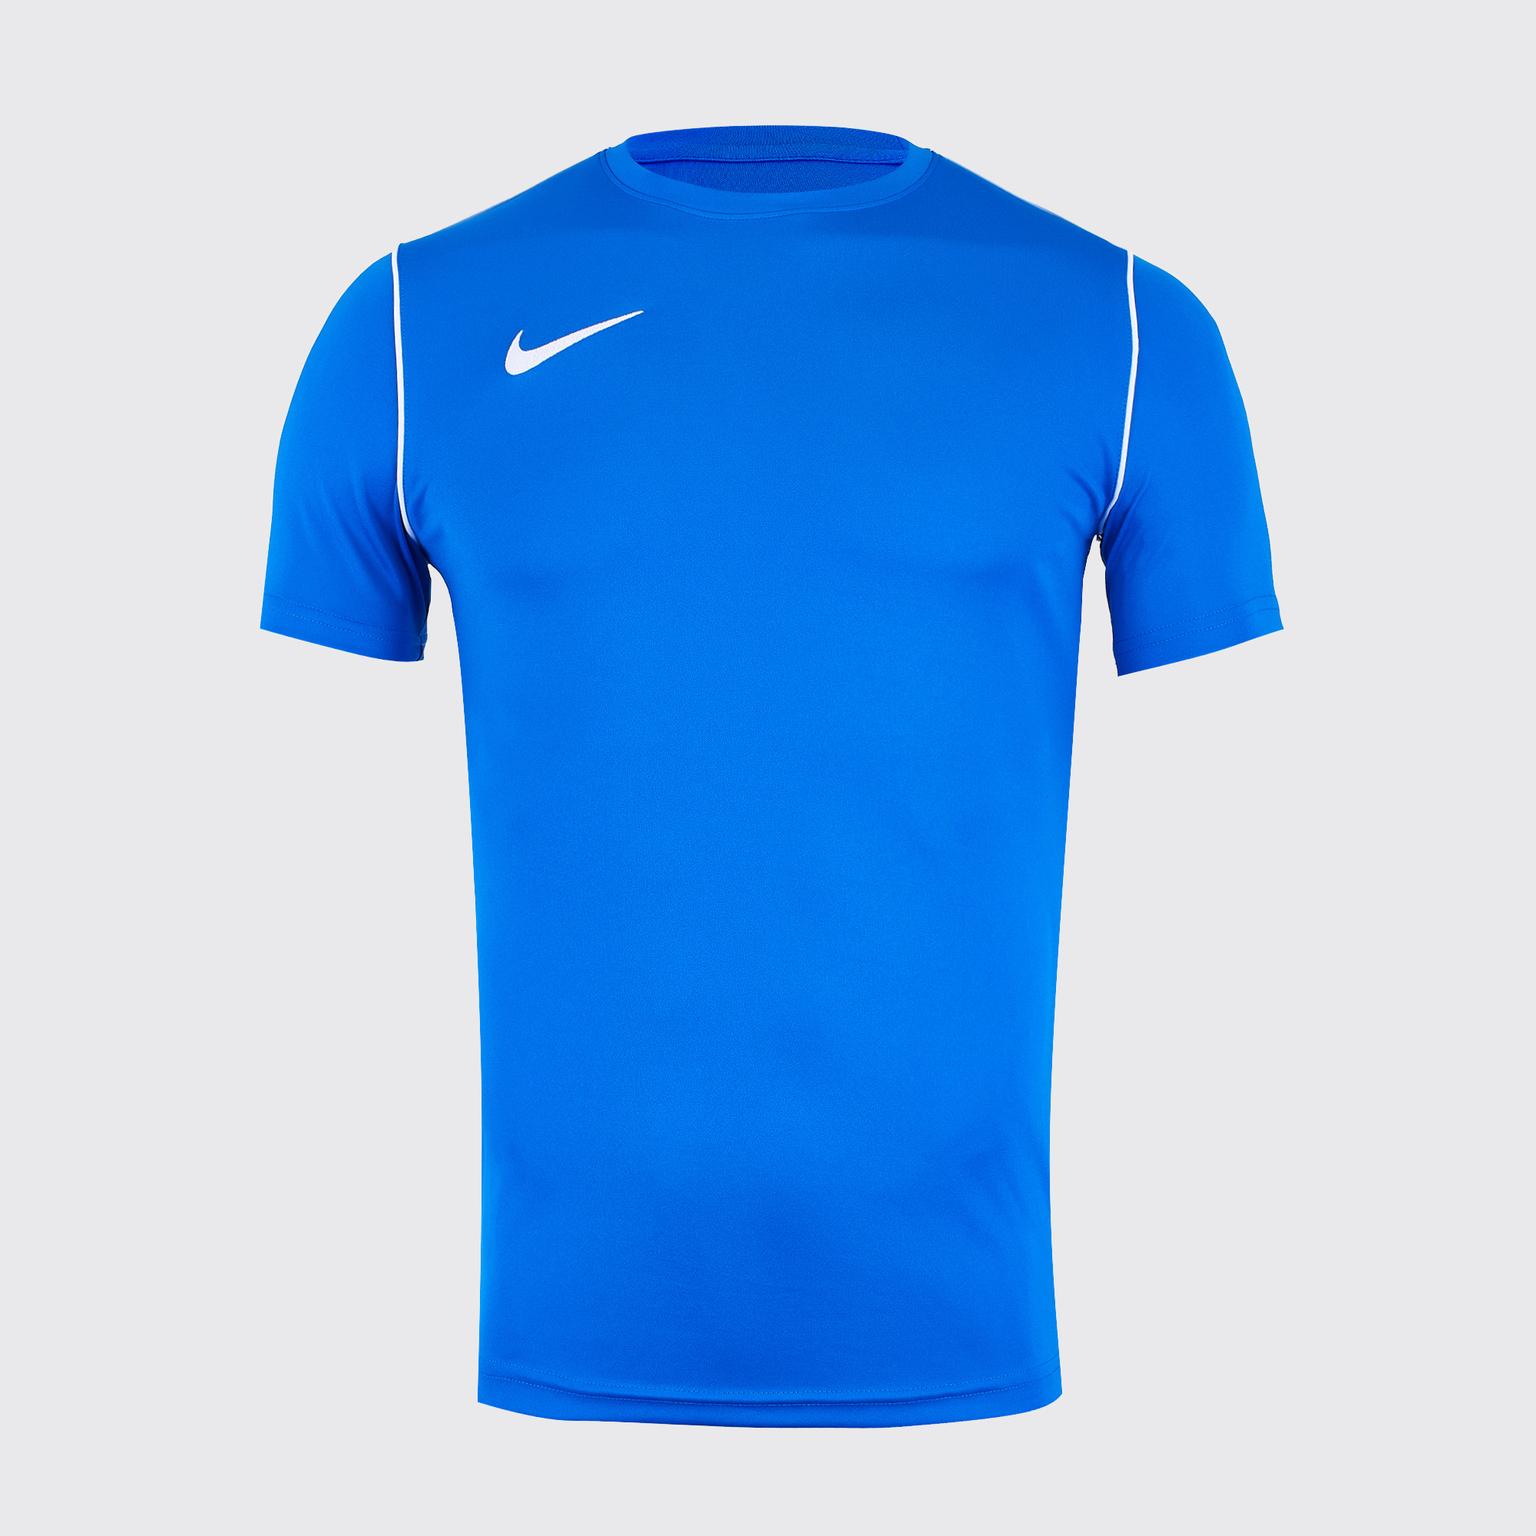 Футболка игровая Nike Dry Park20 BV6883-463 цена и фото